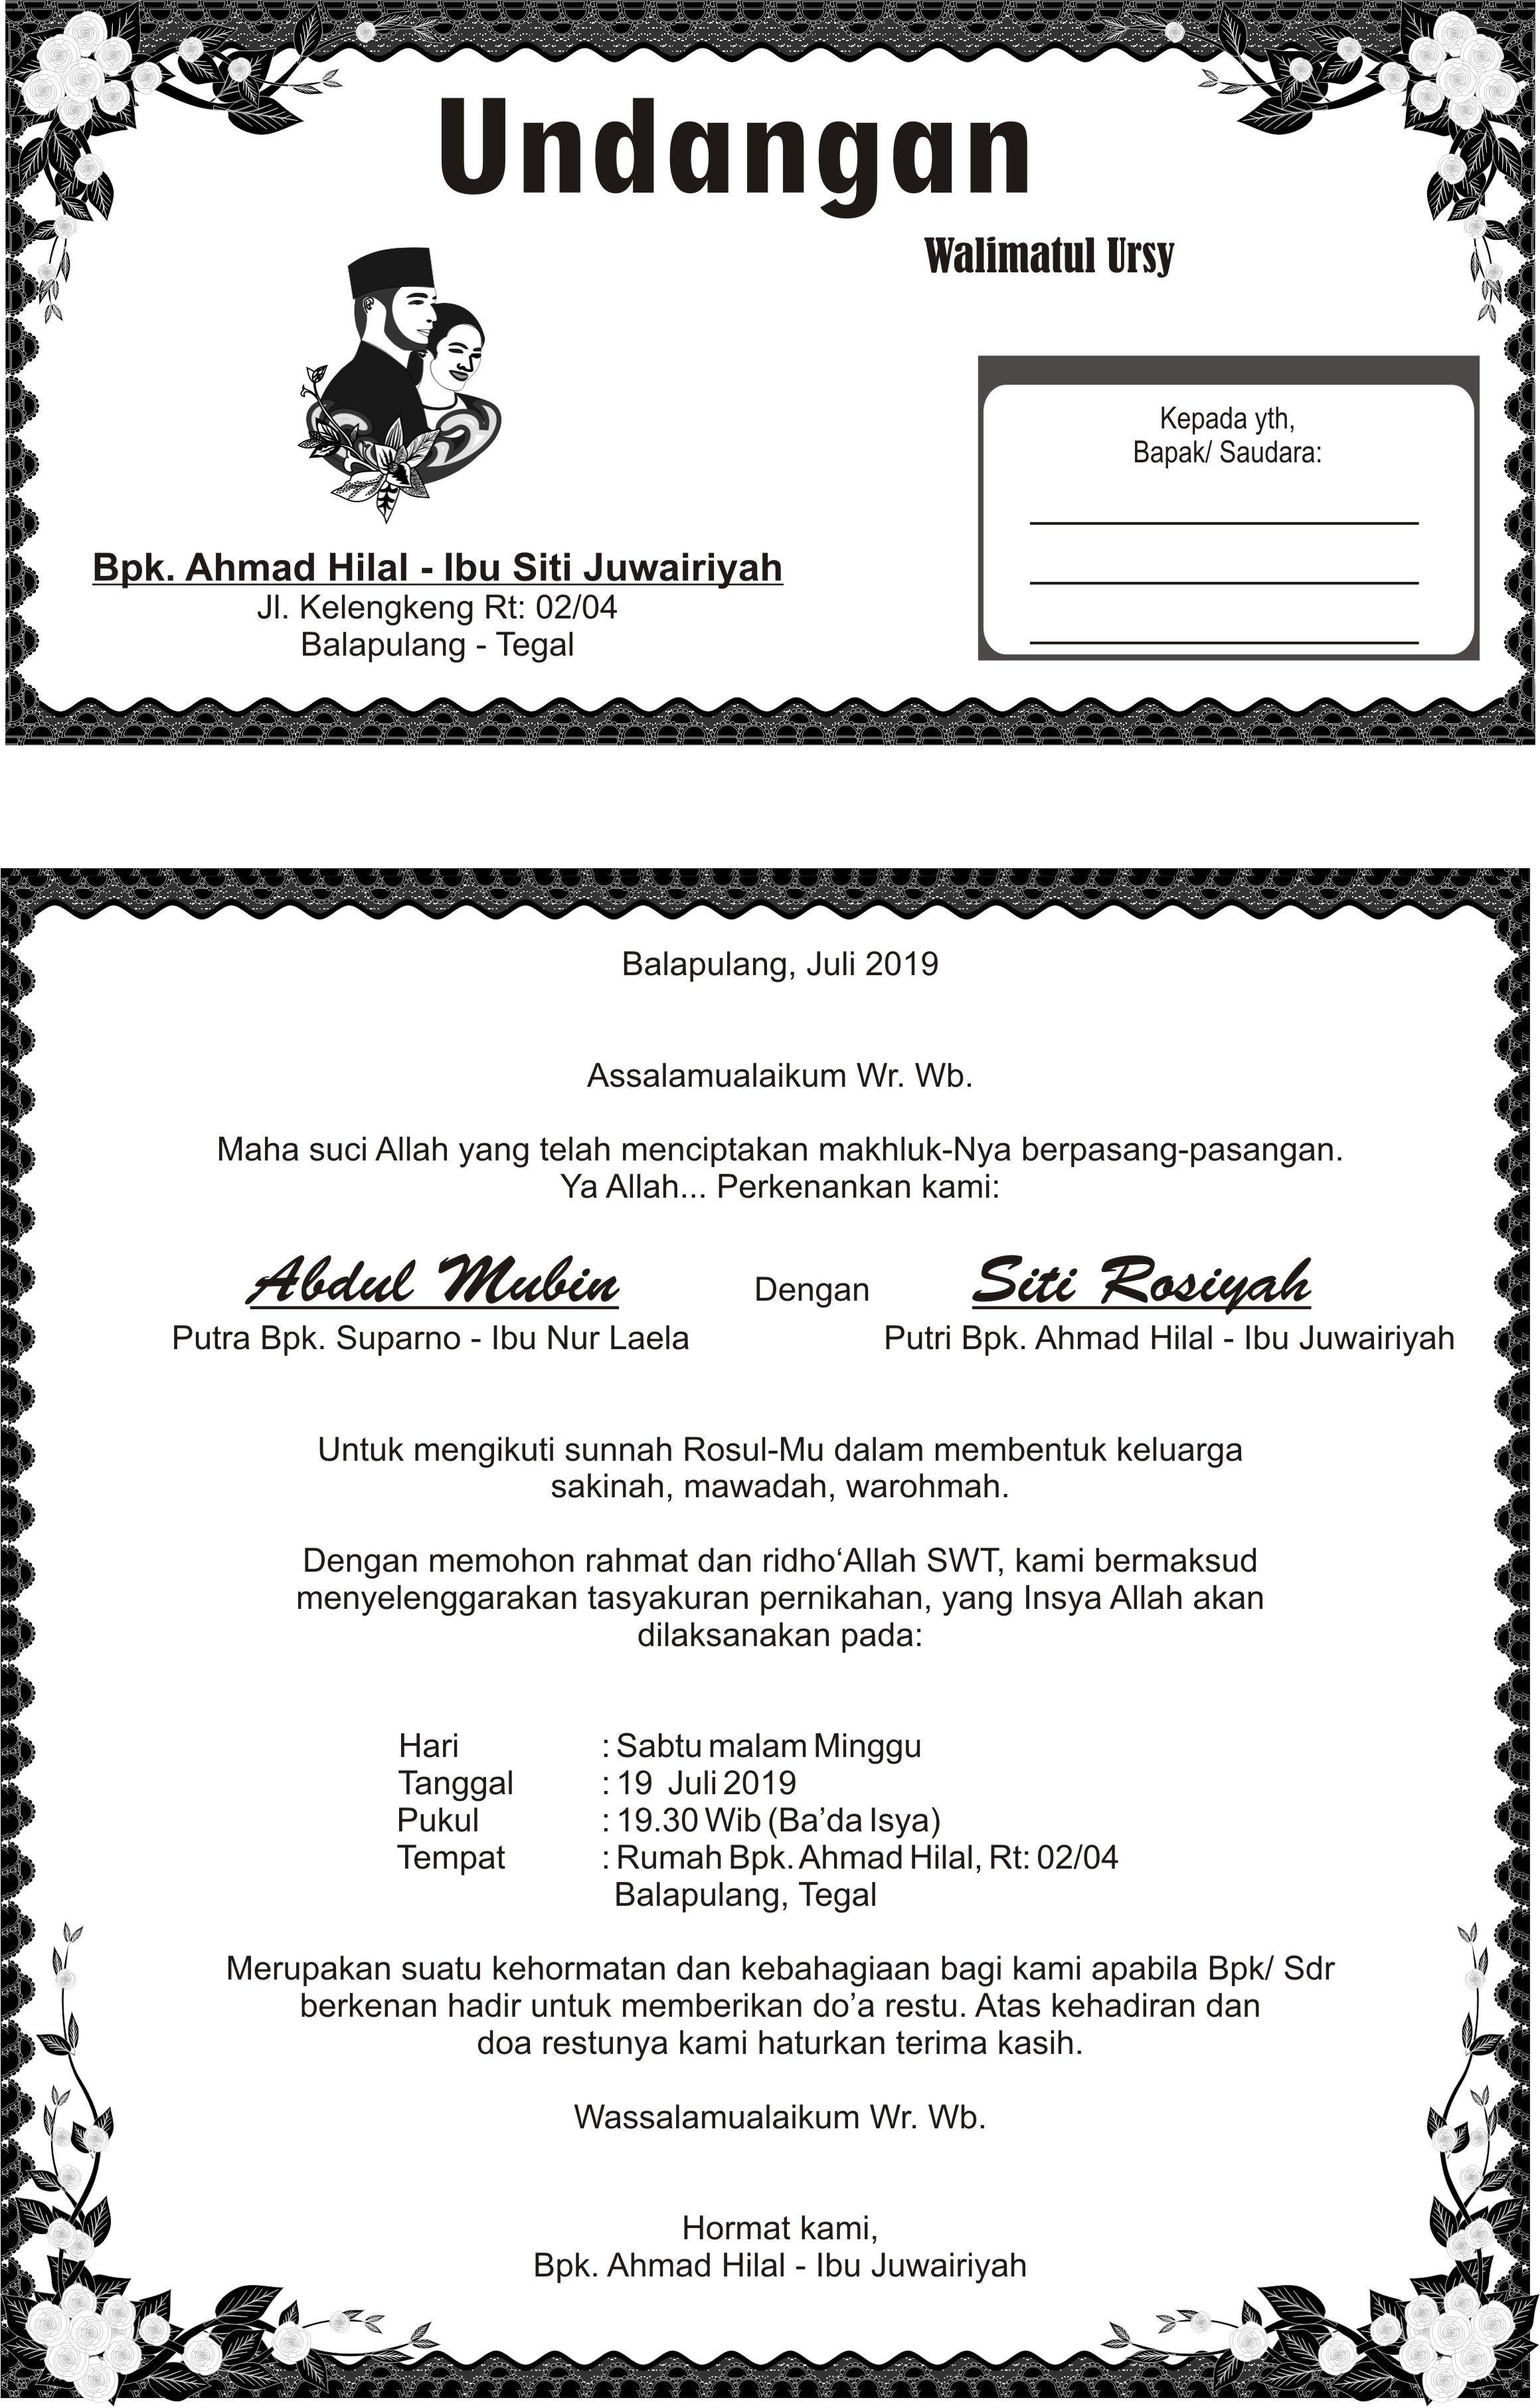 Undangan walimatul ursy siti rosiyah | Undangan, Jenis ...